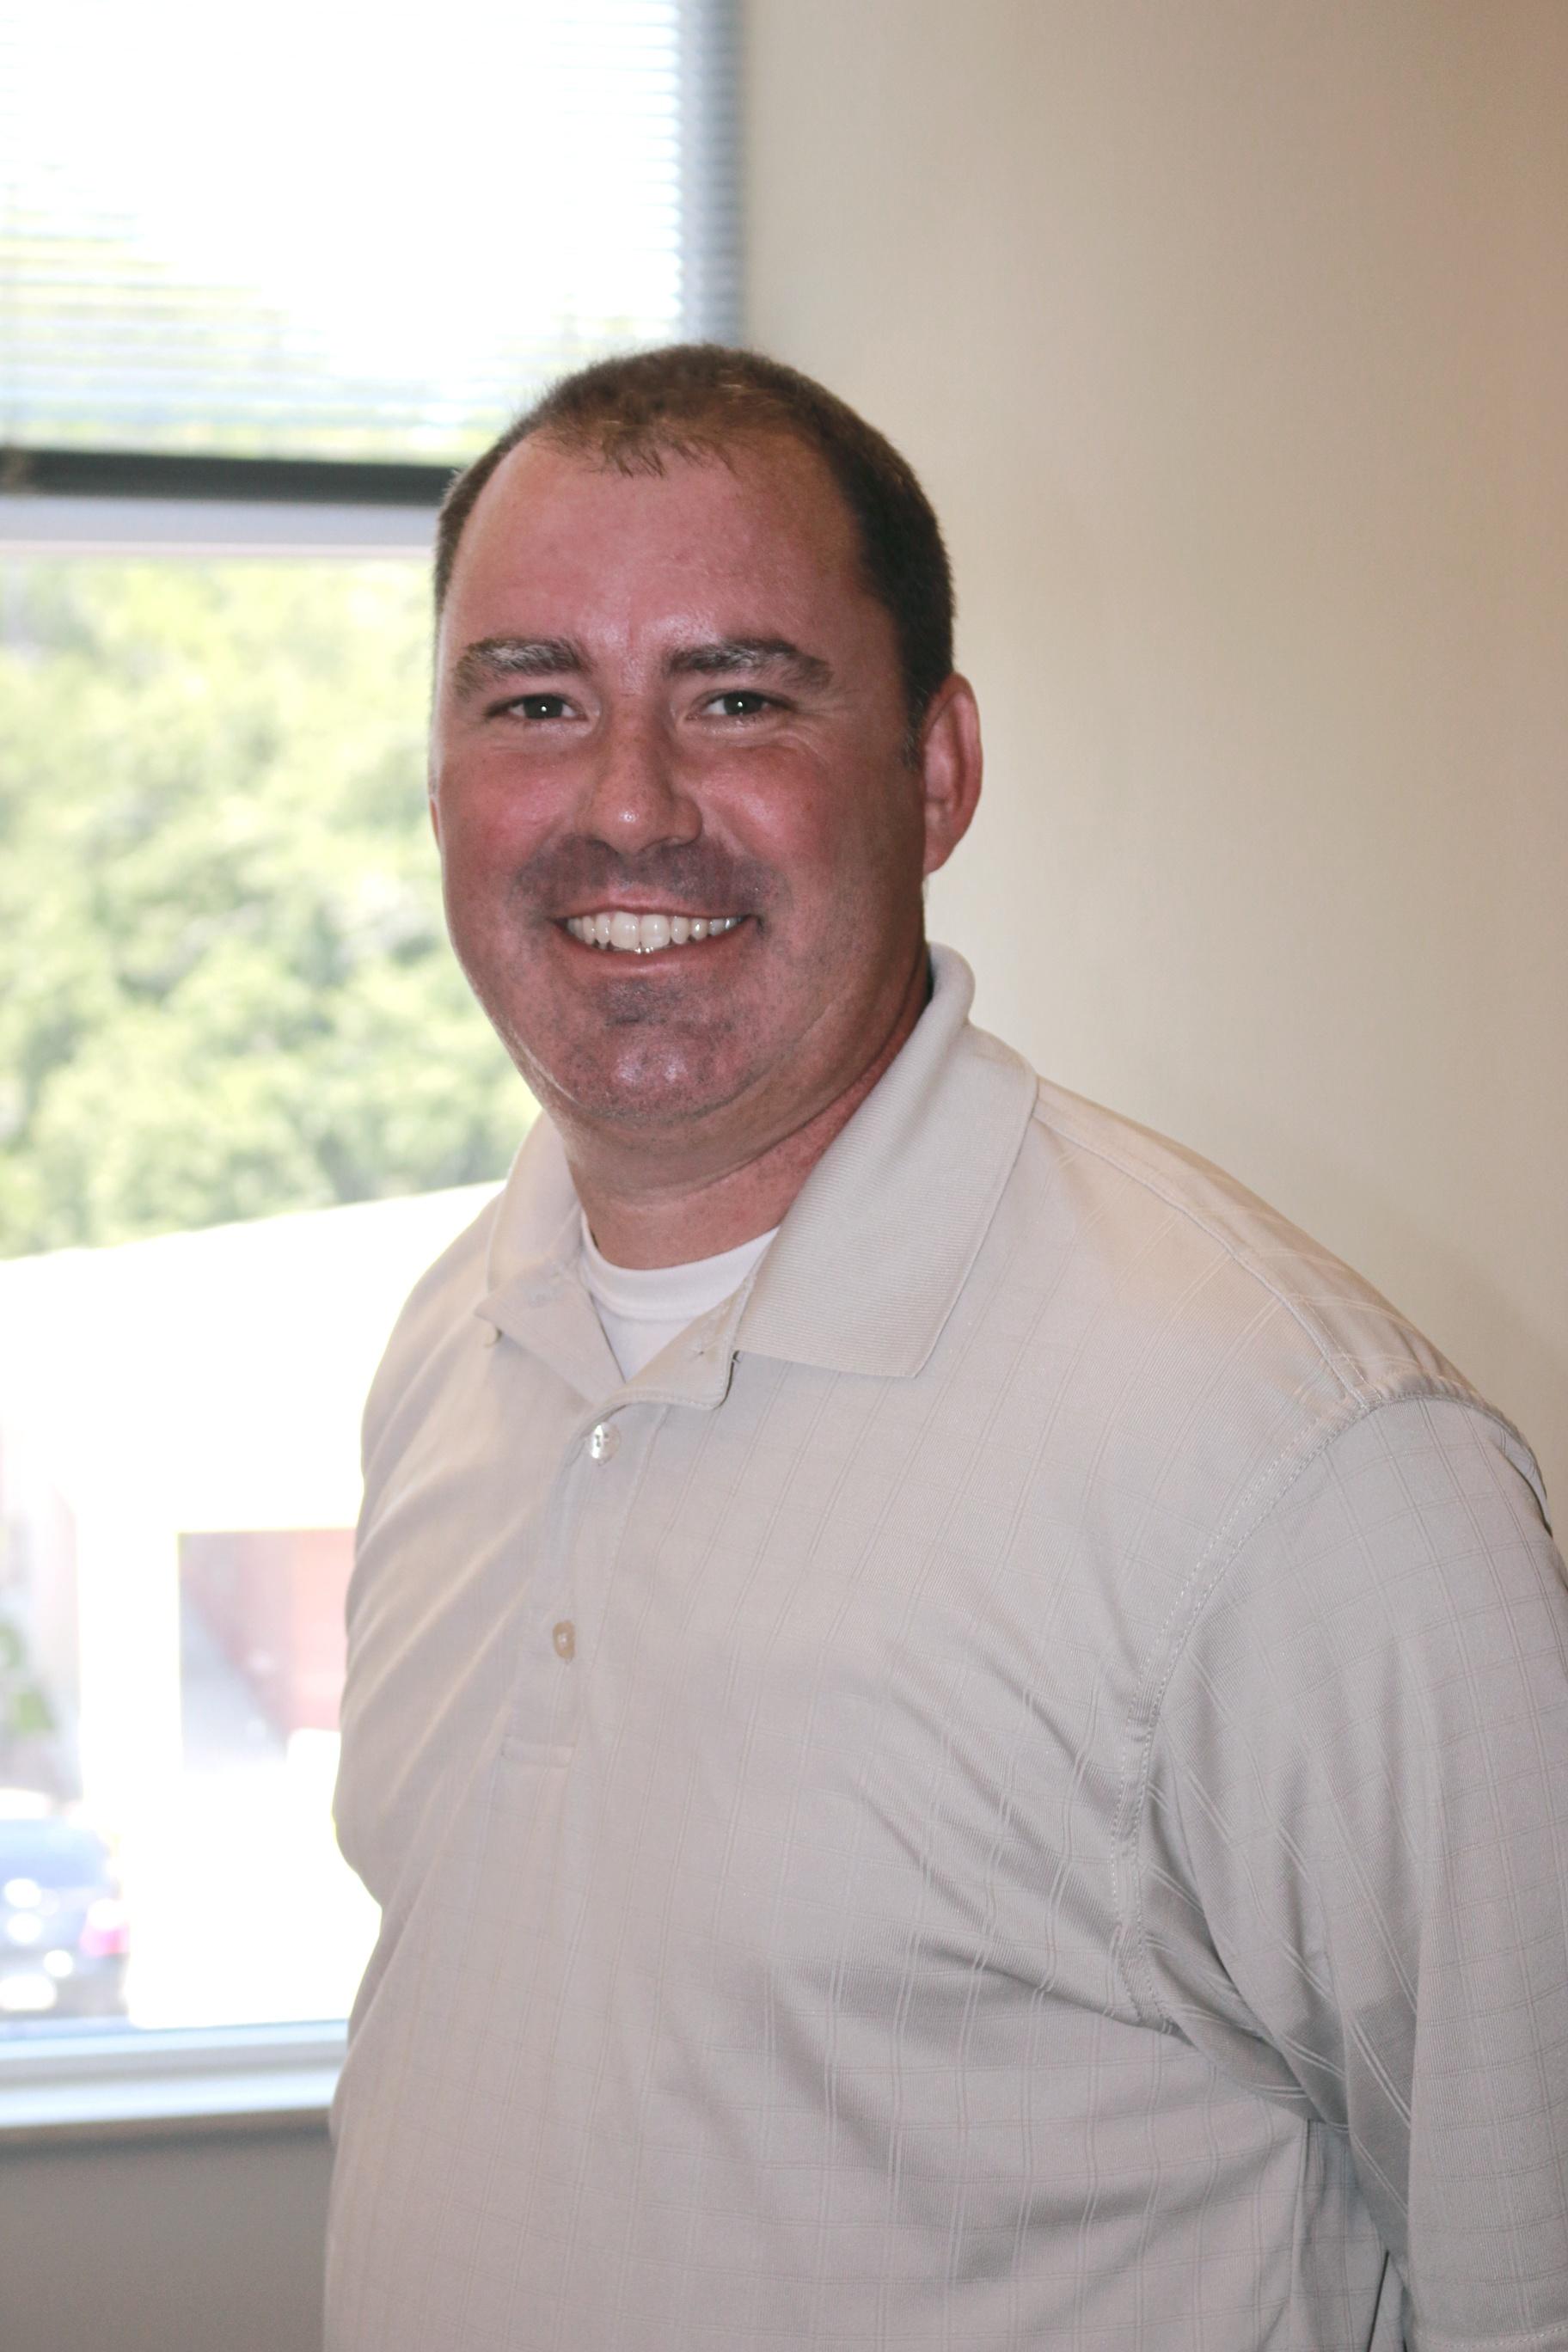 Greg Crawford - Georgia Southern University